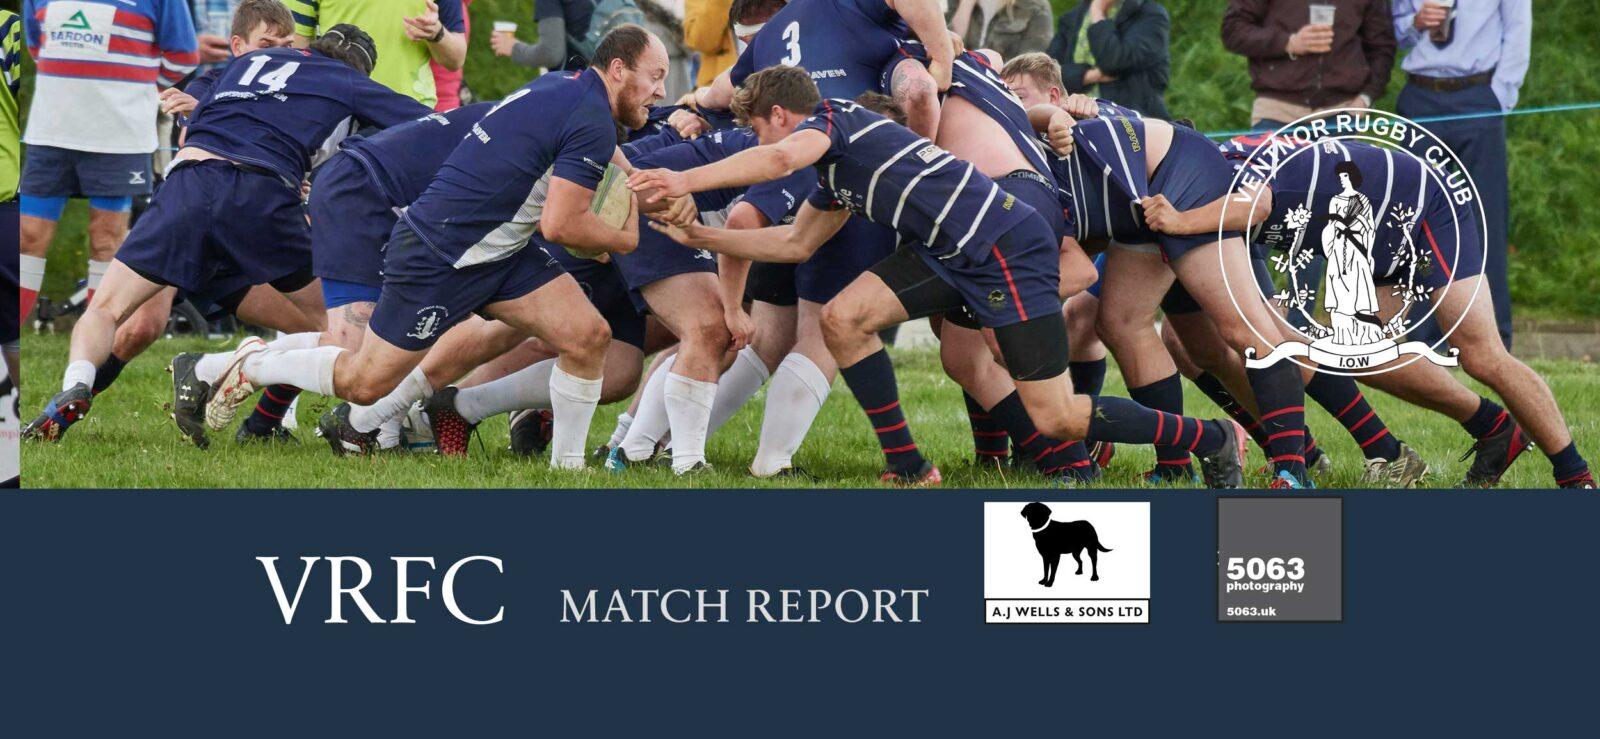 Match-report-Sandown-&-Shanklin1st-XV-RFC-v-Ventnor-RFC-1st-XV-16092017-slider-a